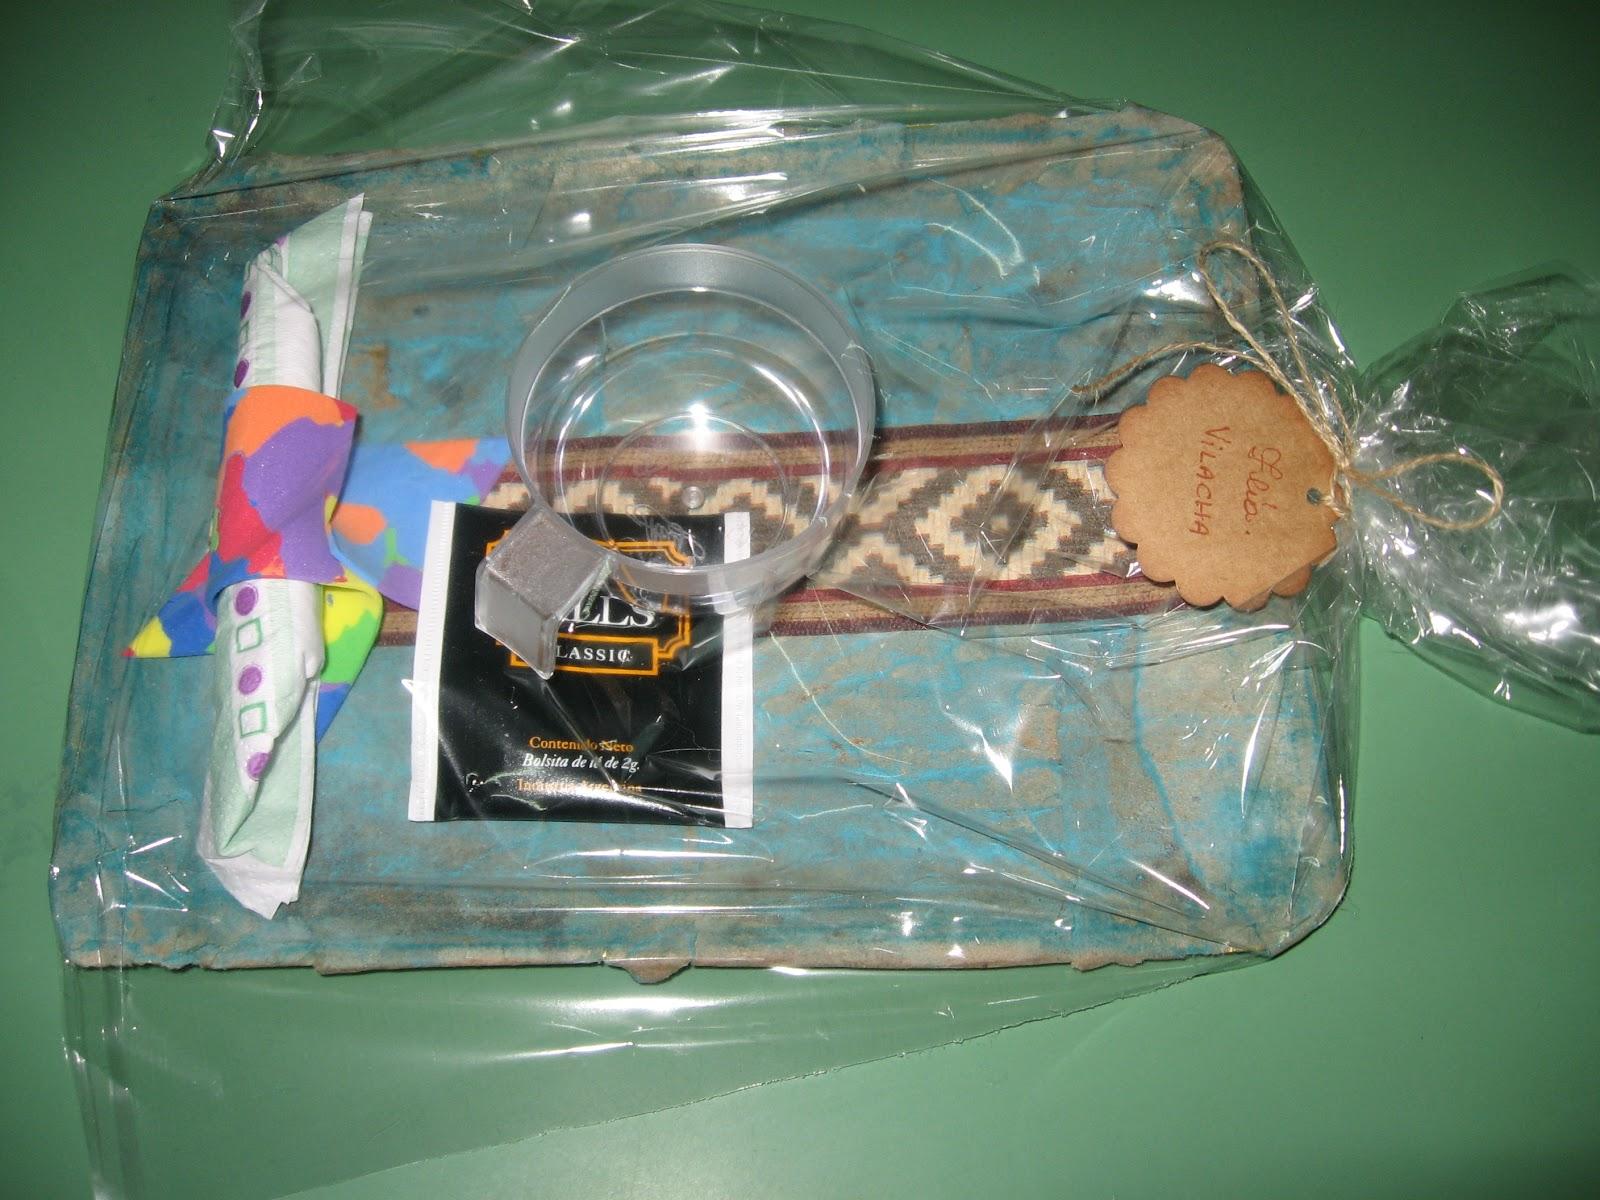 El arc n del ngel la cartapesta for Amapola jardin de infantes